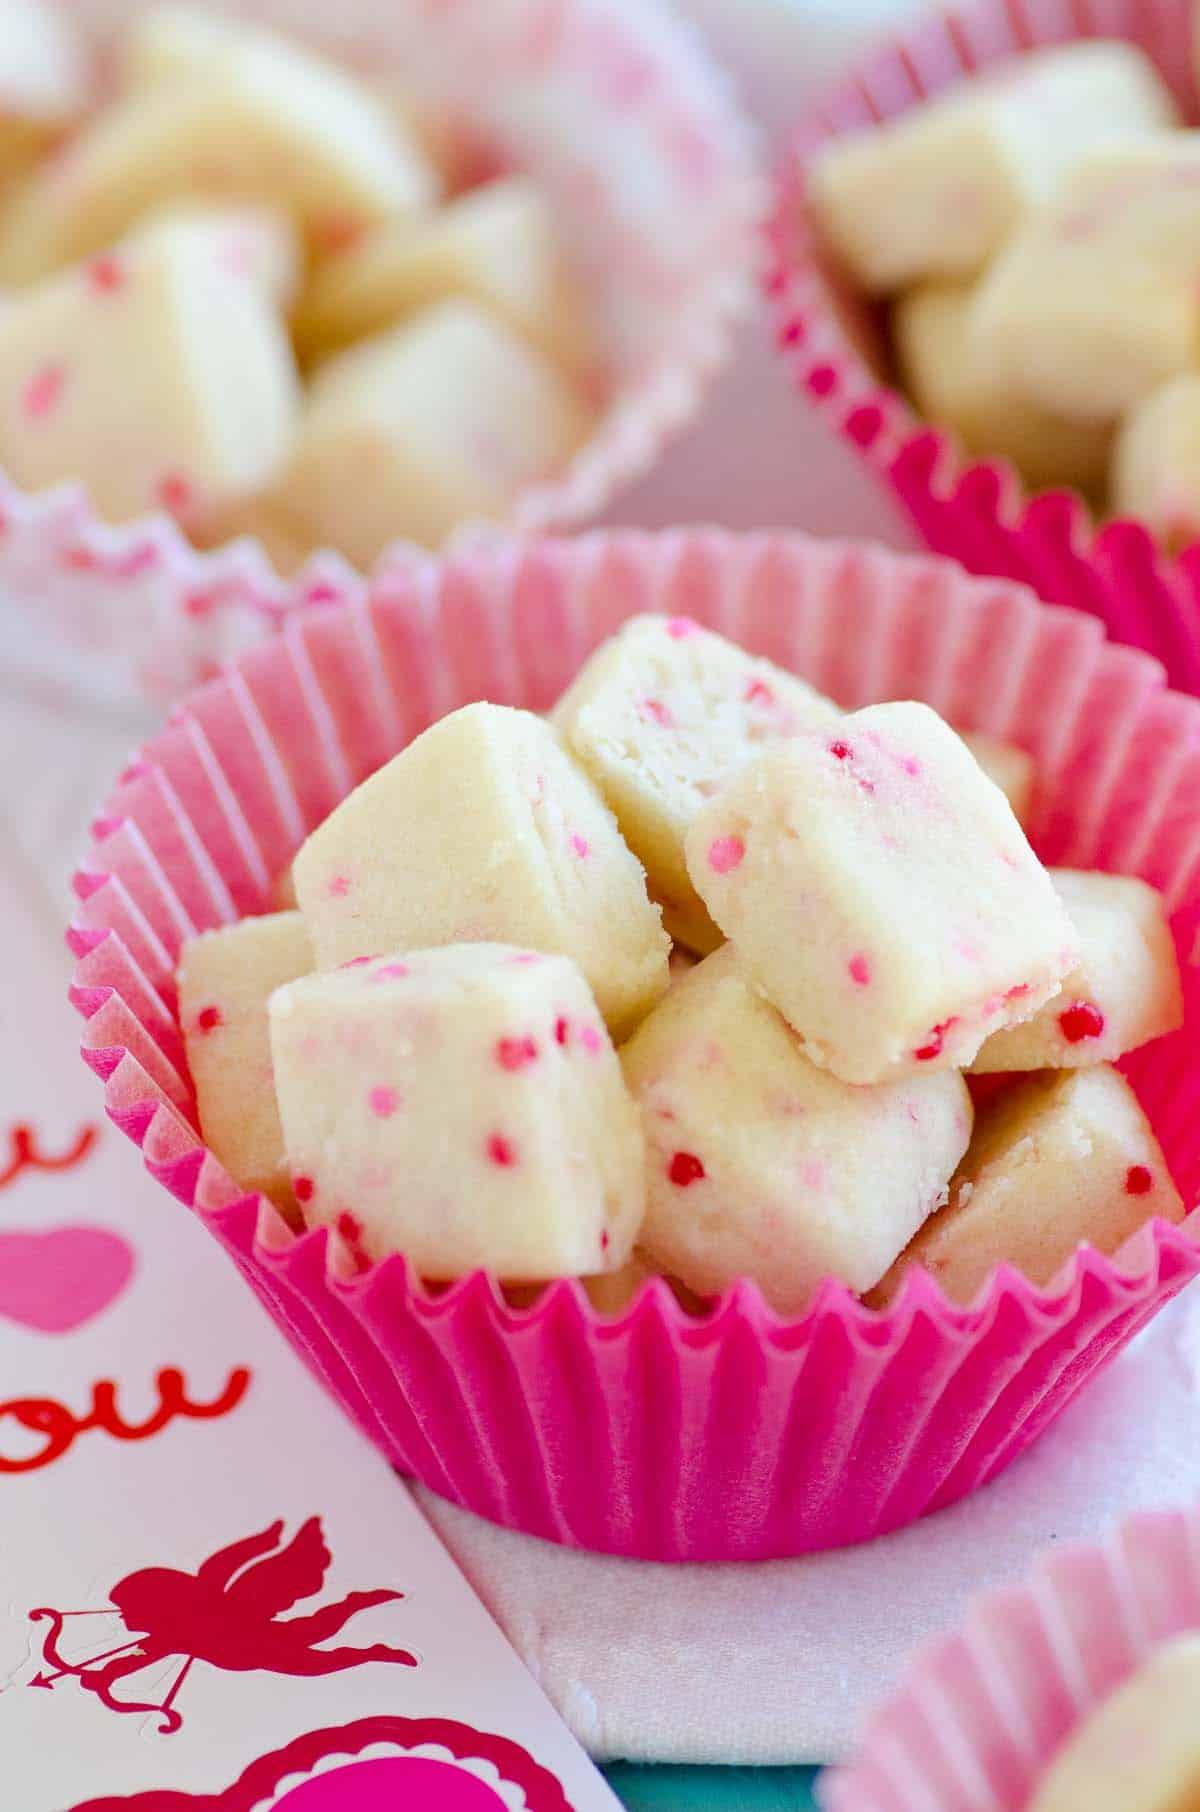 shortbread bites with red sprinkles in pink cupcake liner